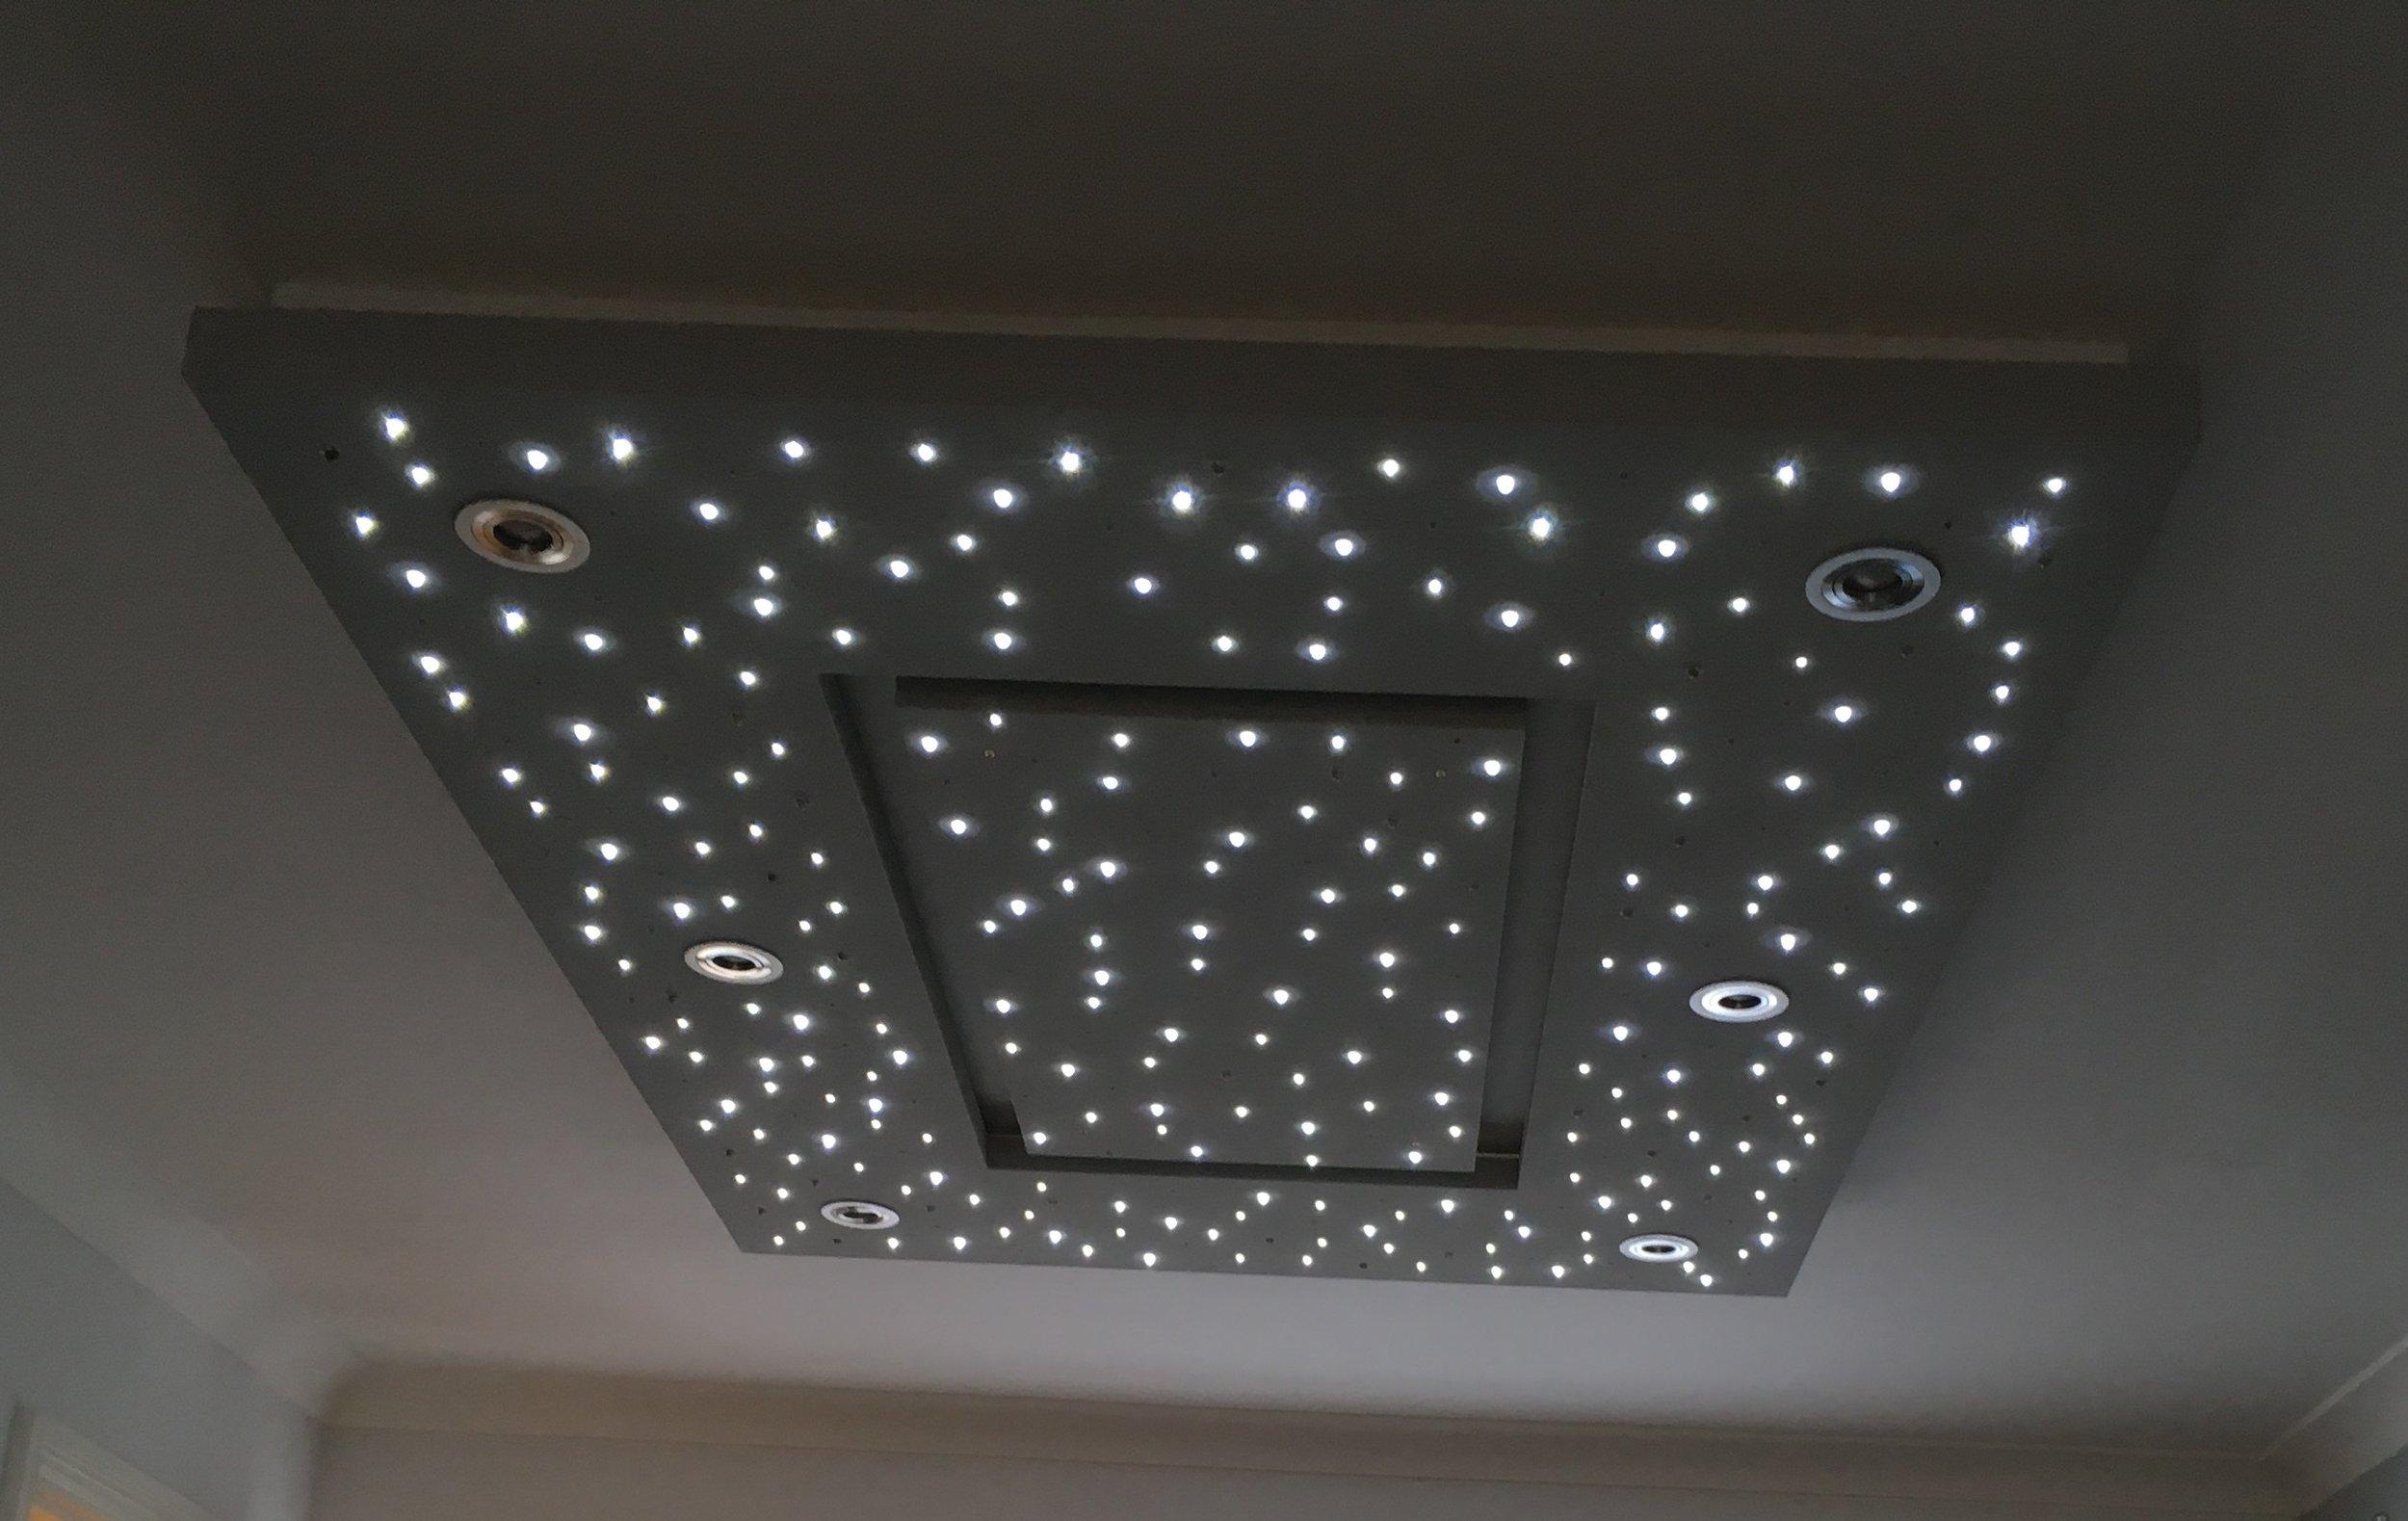 star ceiling in Living room, stars on